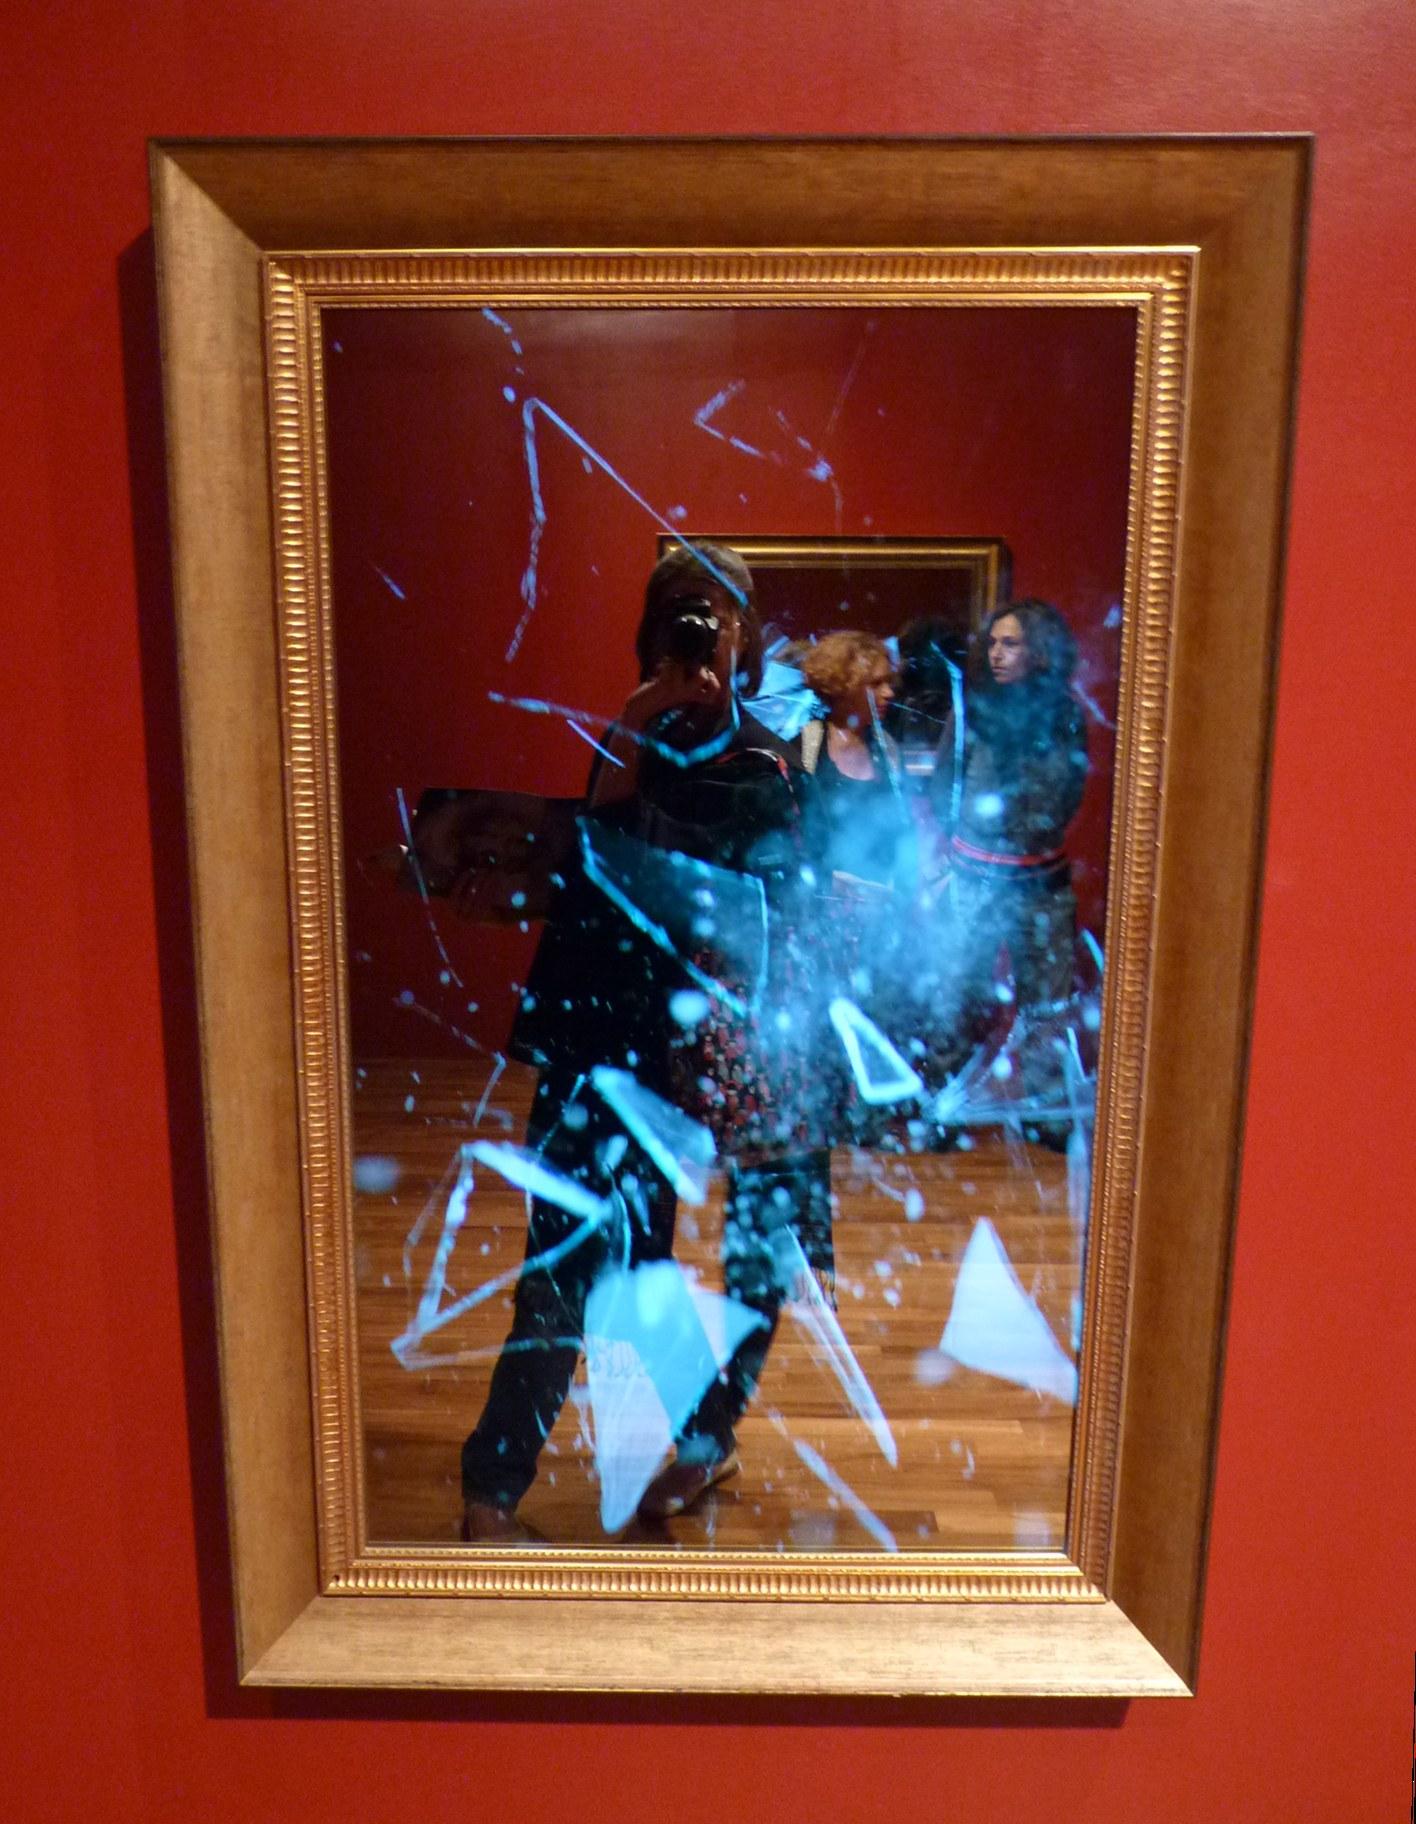 Broken mirror, installation vidéo, Pavillon coréen, Venise